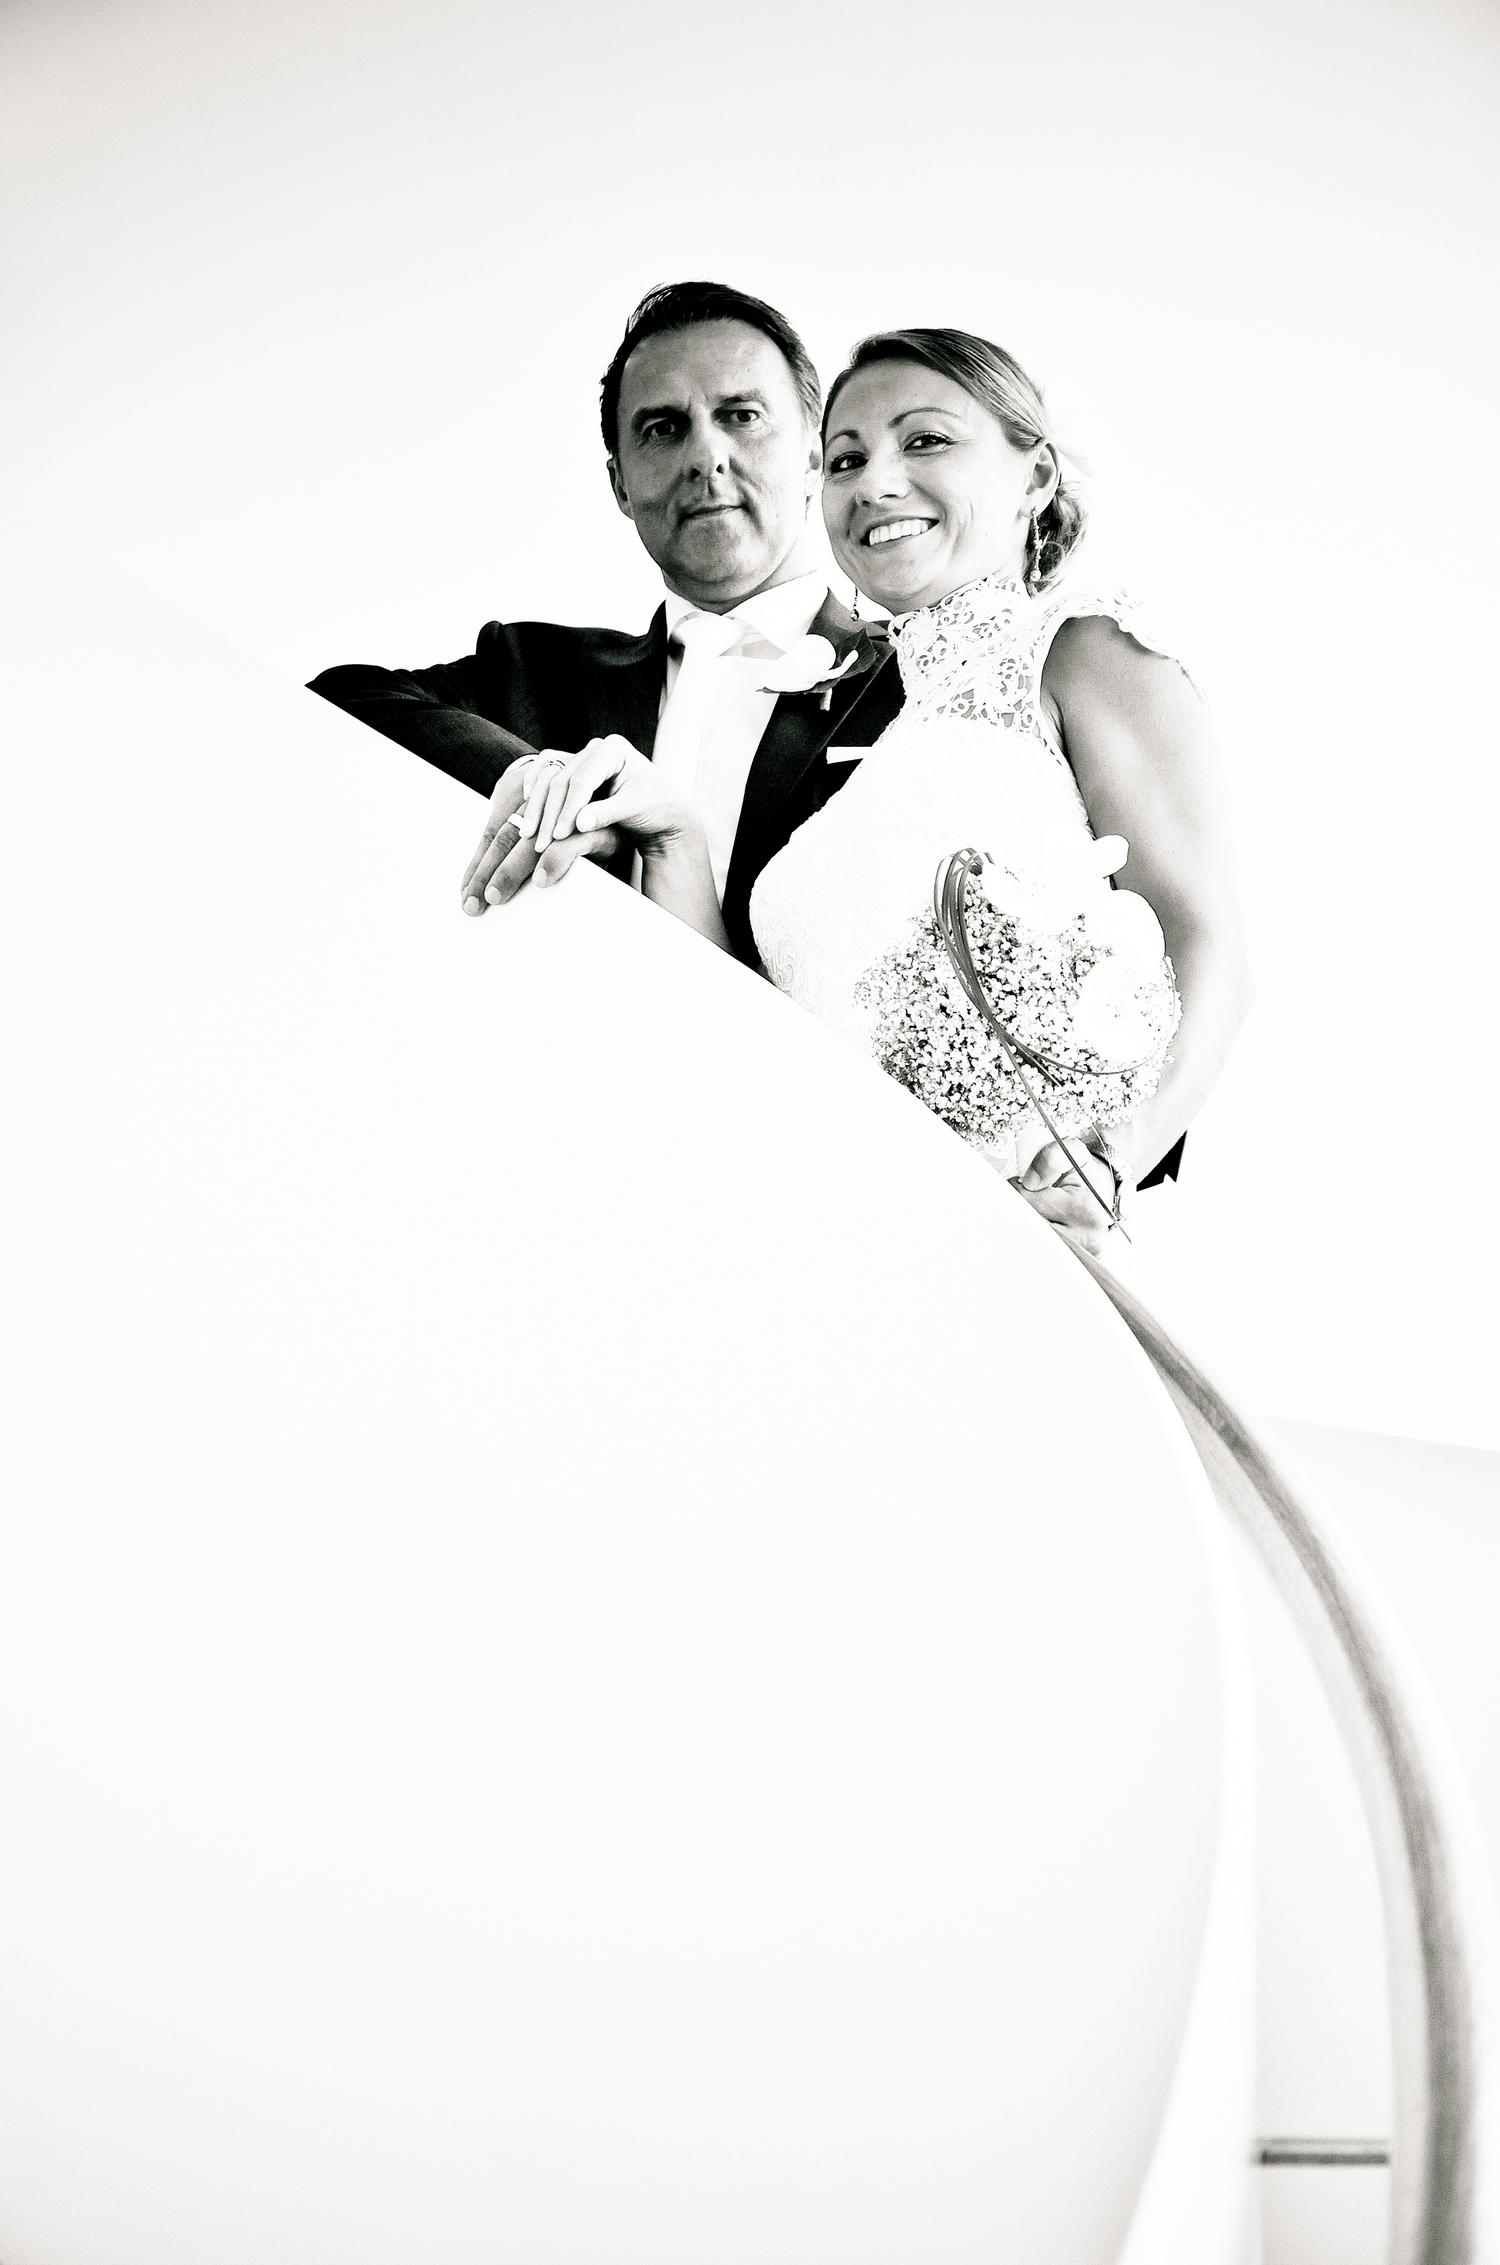 Brautpaar S/W